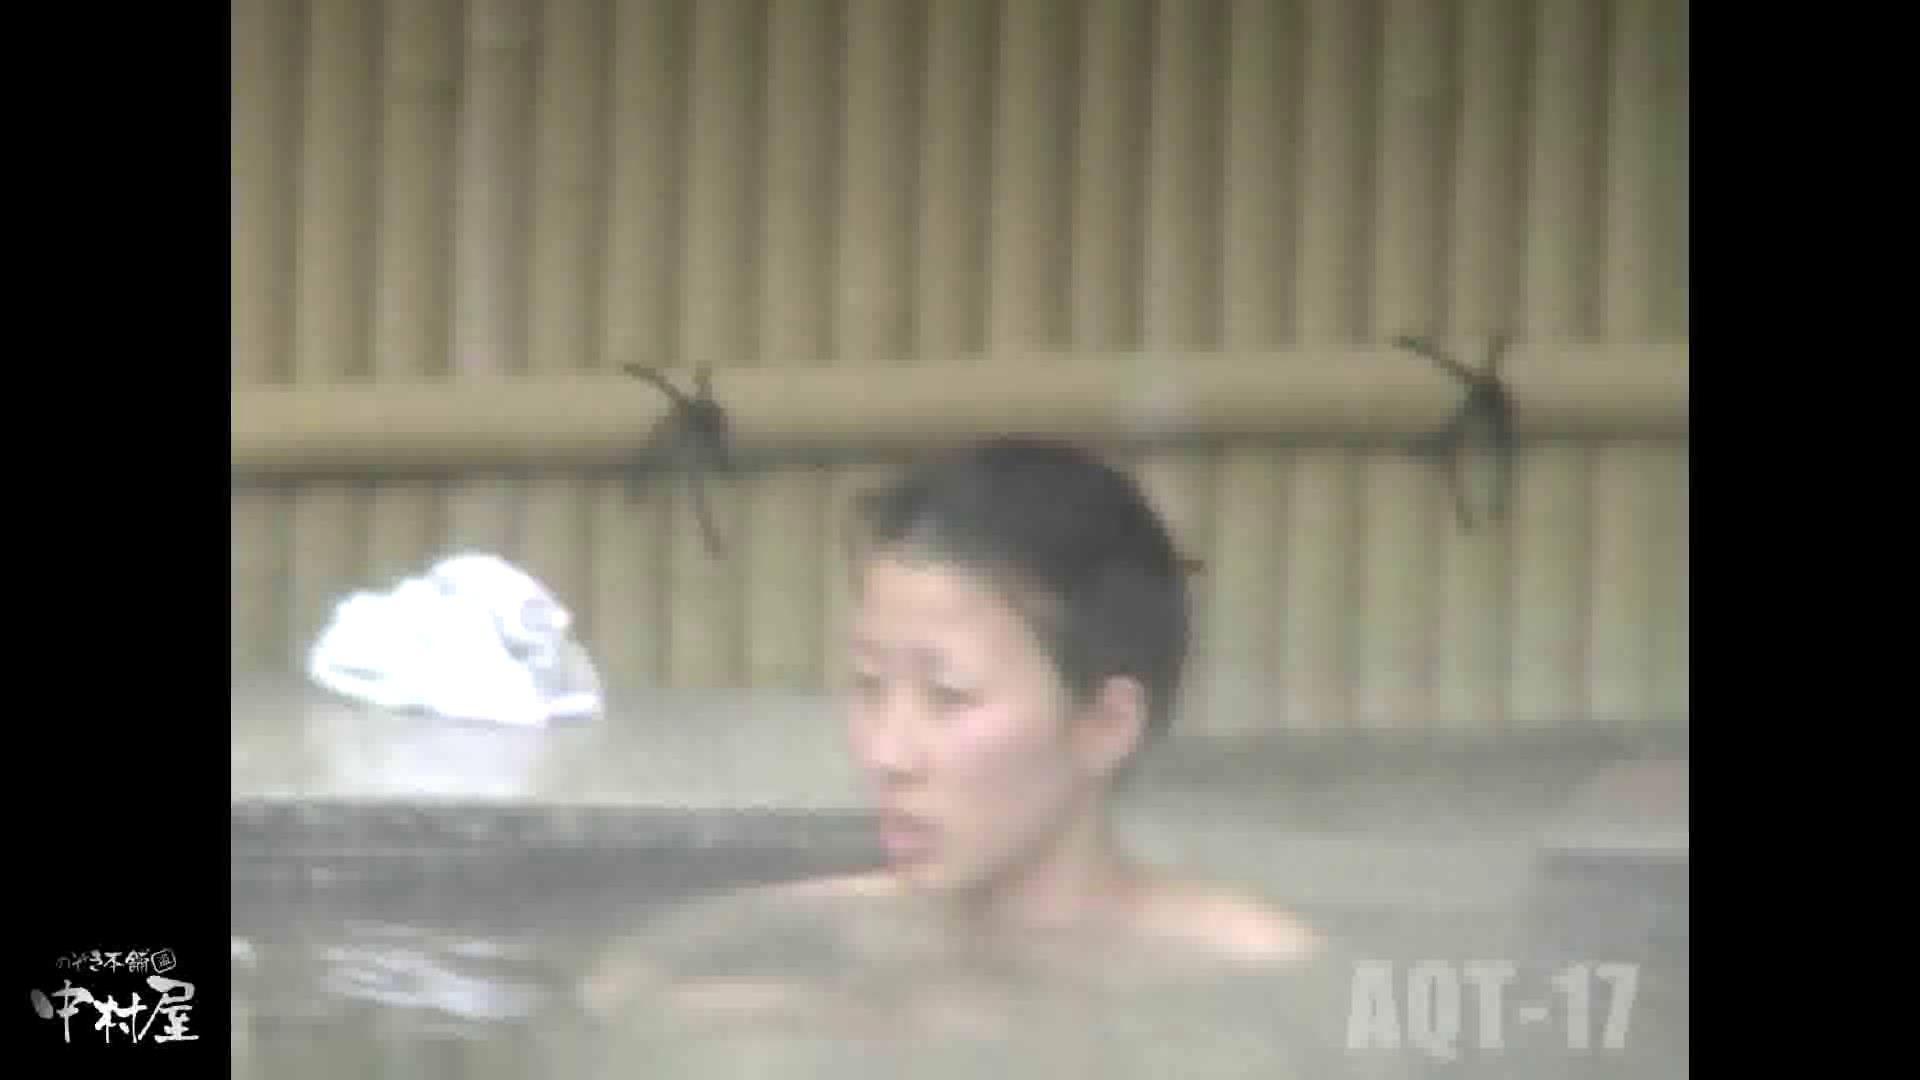 Aquaな露天風呂Vol.881潜入盗撮露天風呂十七判湯 其の二 露天   HなOL  101pic 2